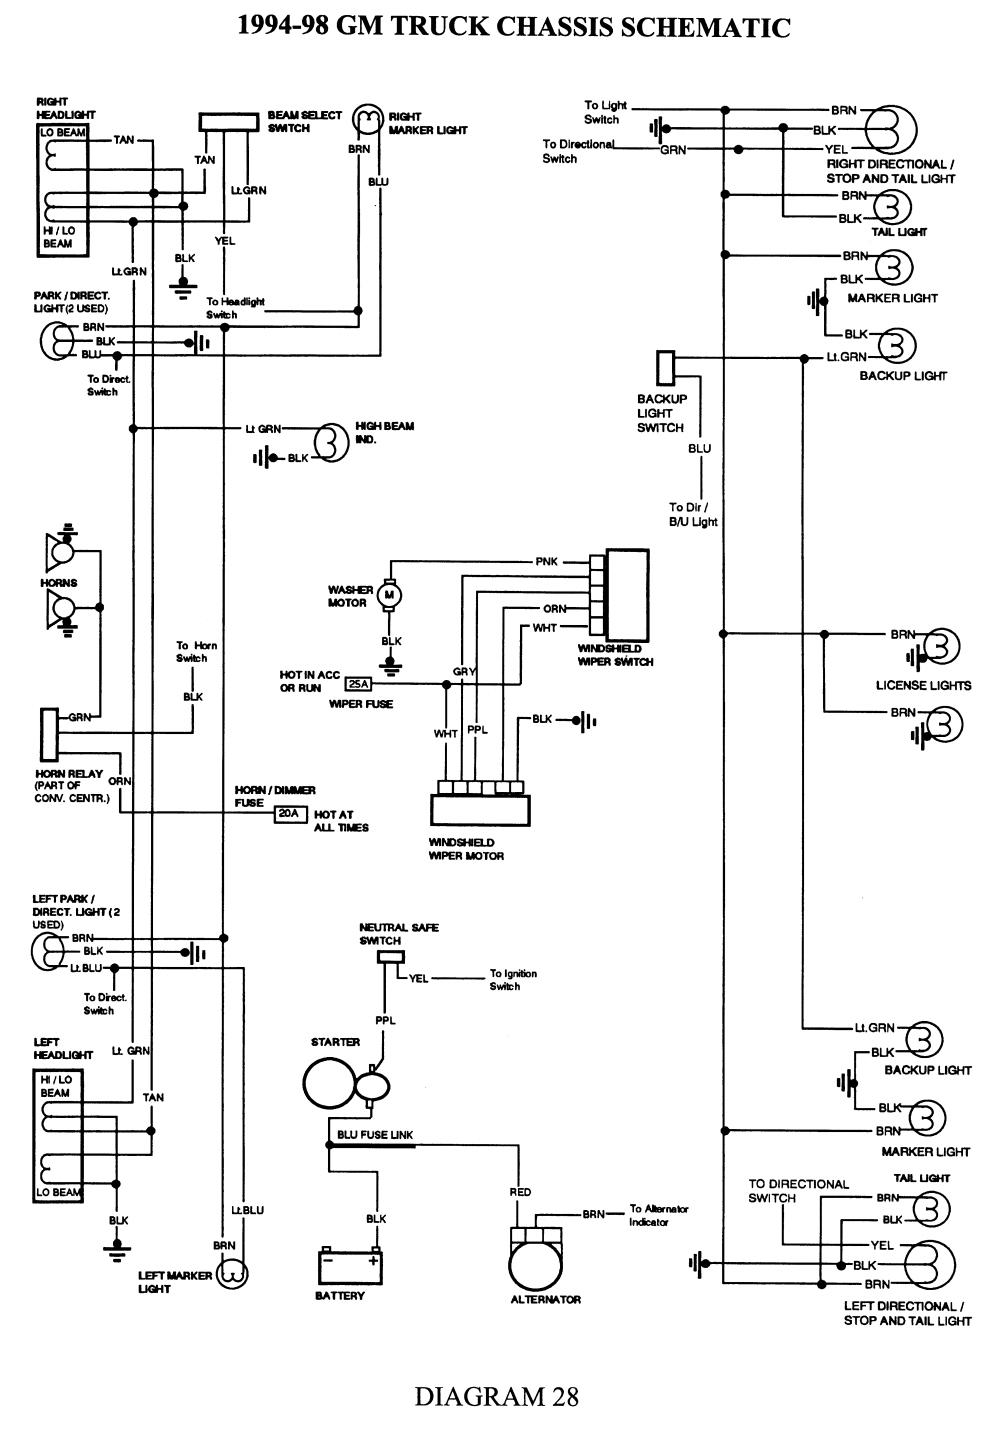 Gm Headlight Wiring Diagram | Schematic Diagram - Headlight Dimmer Switch Wiring Diagram